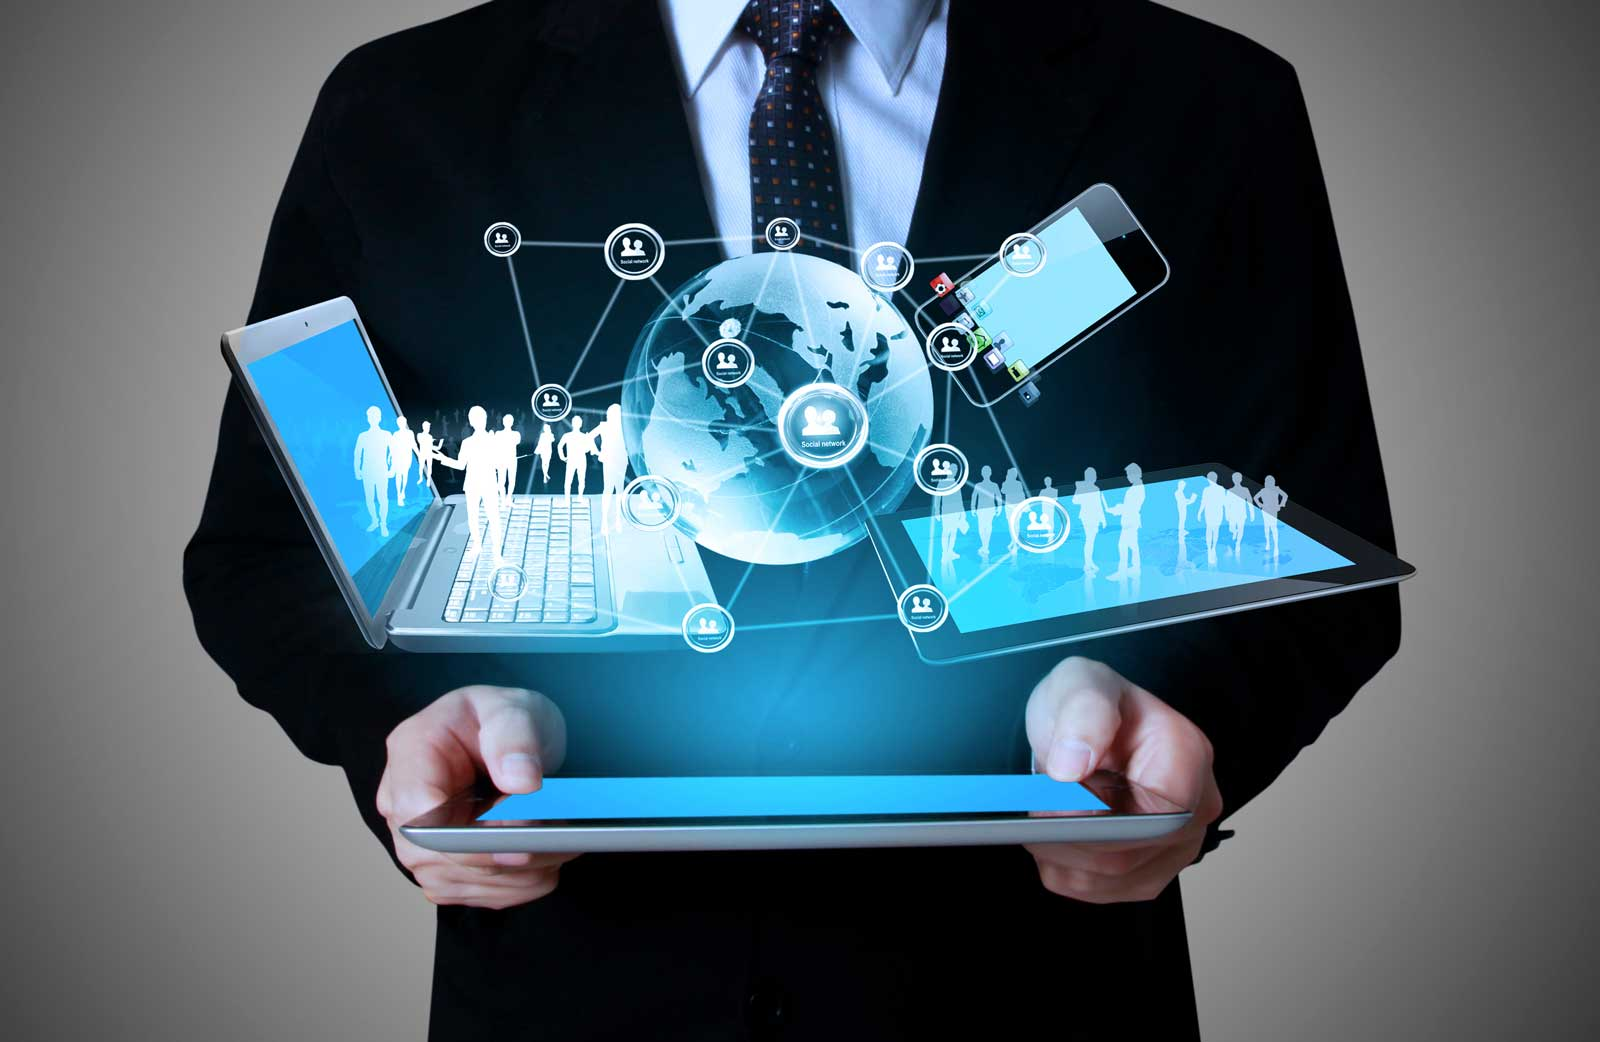 UK Gov't Researching Distributed Ledger Technology for Securing Digital Evidence